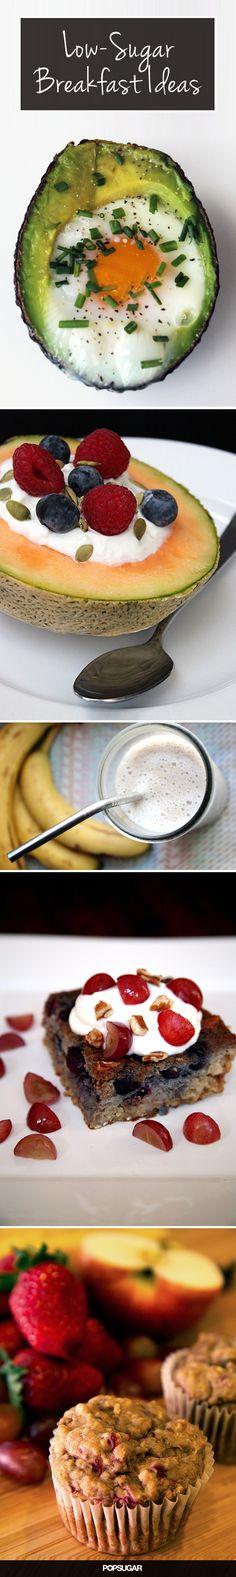 Skip the Scone! Low-Sugar Breakfast Ideas With Under 30 Grams